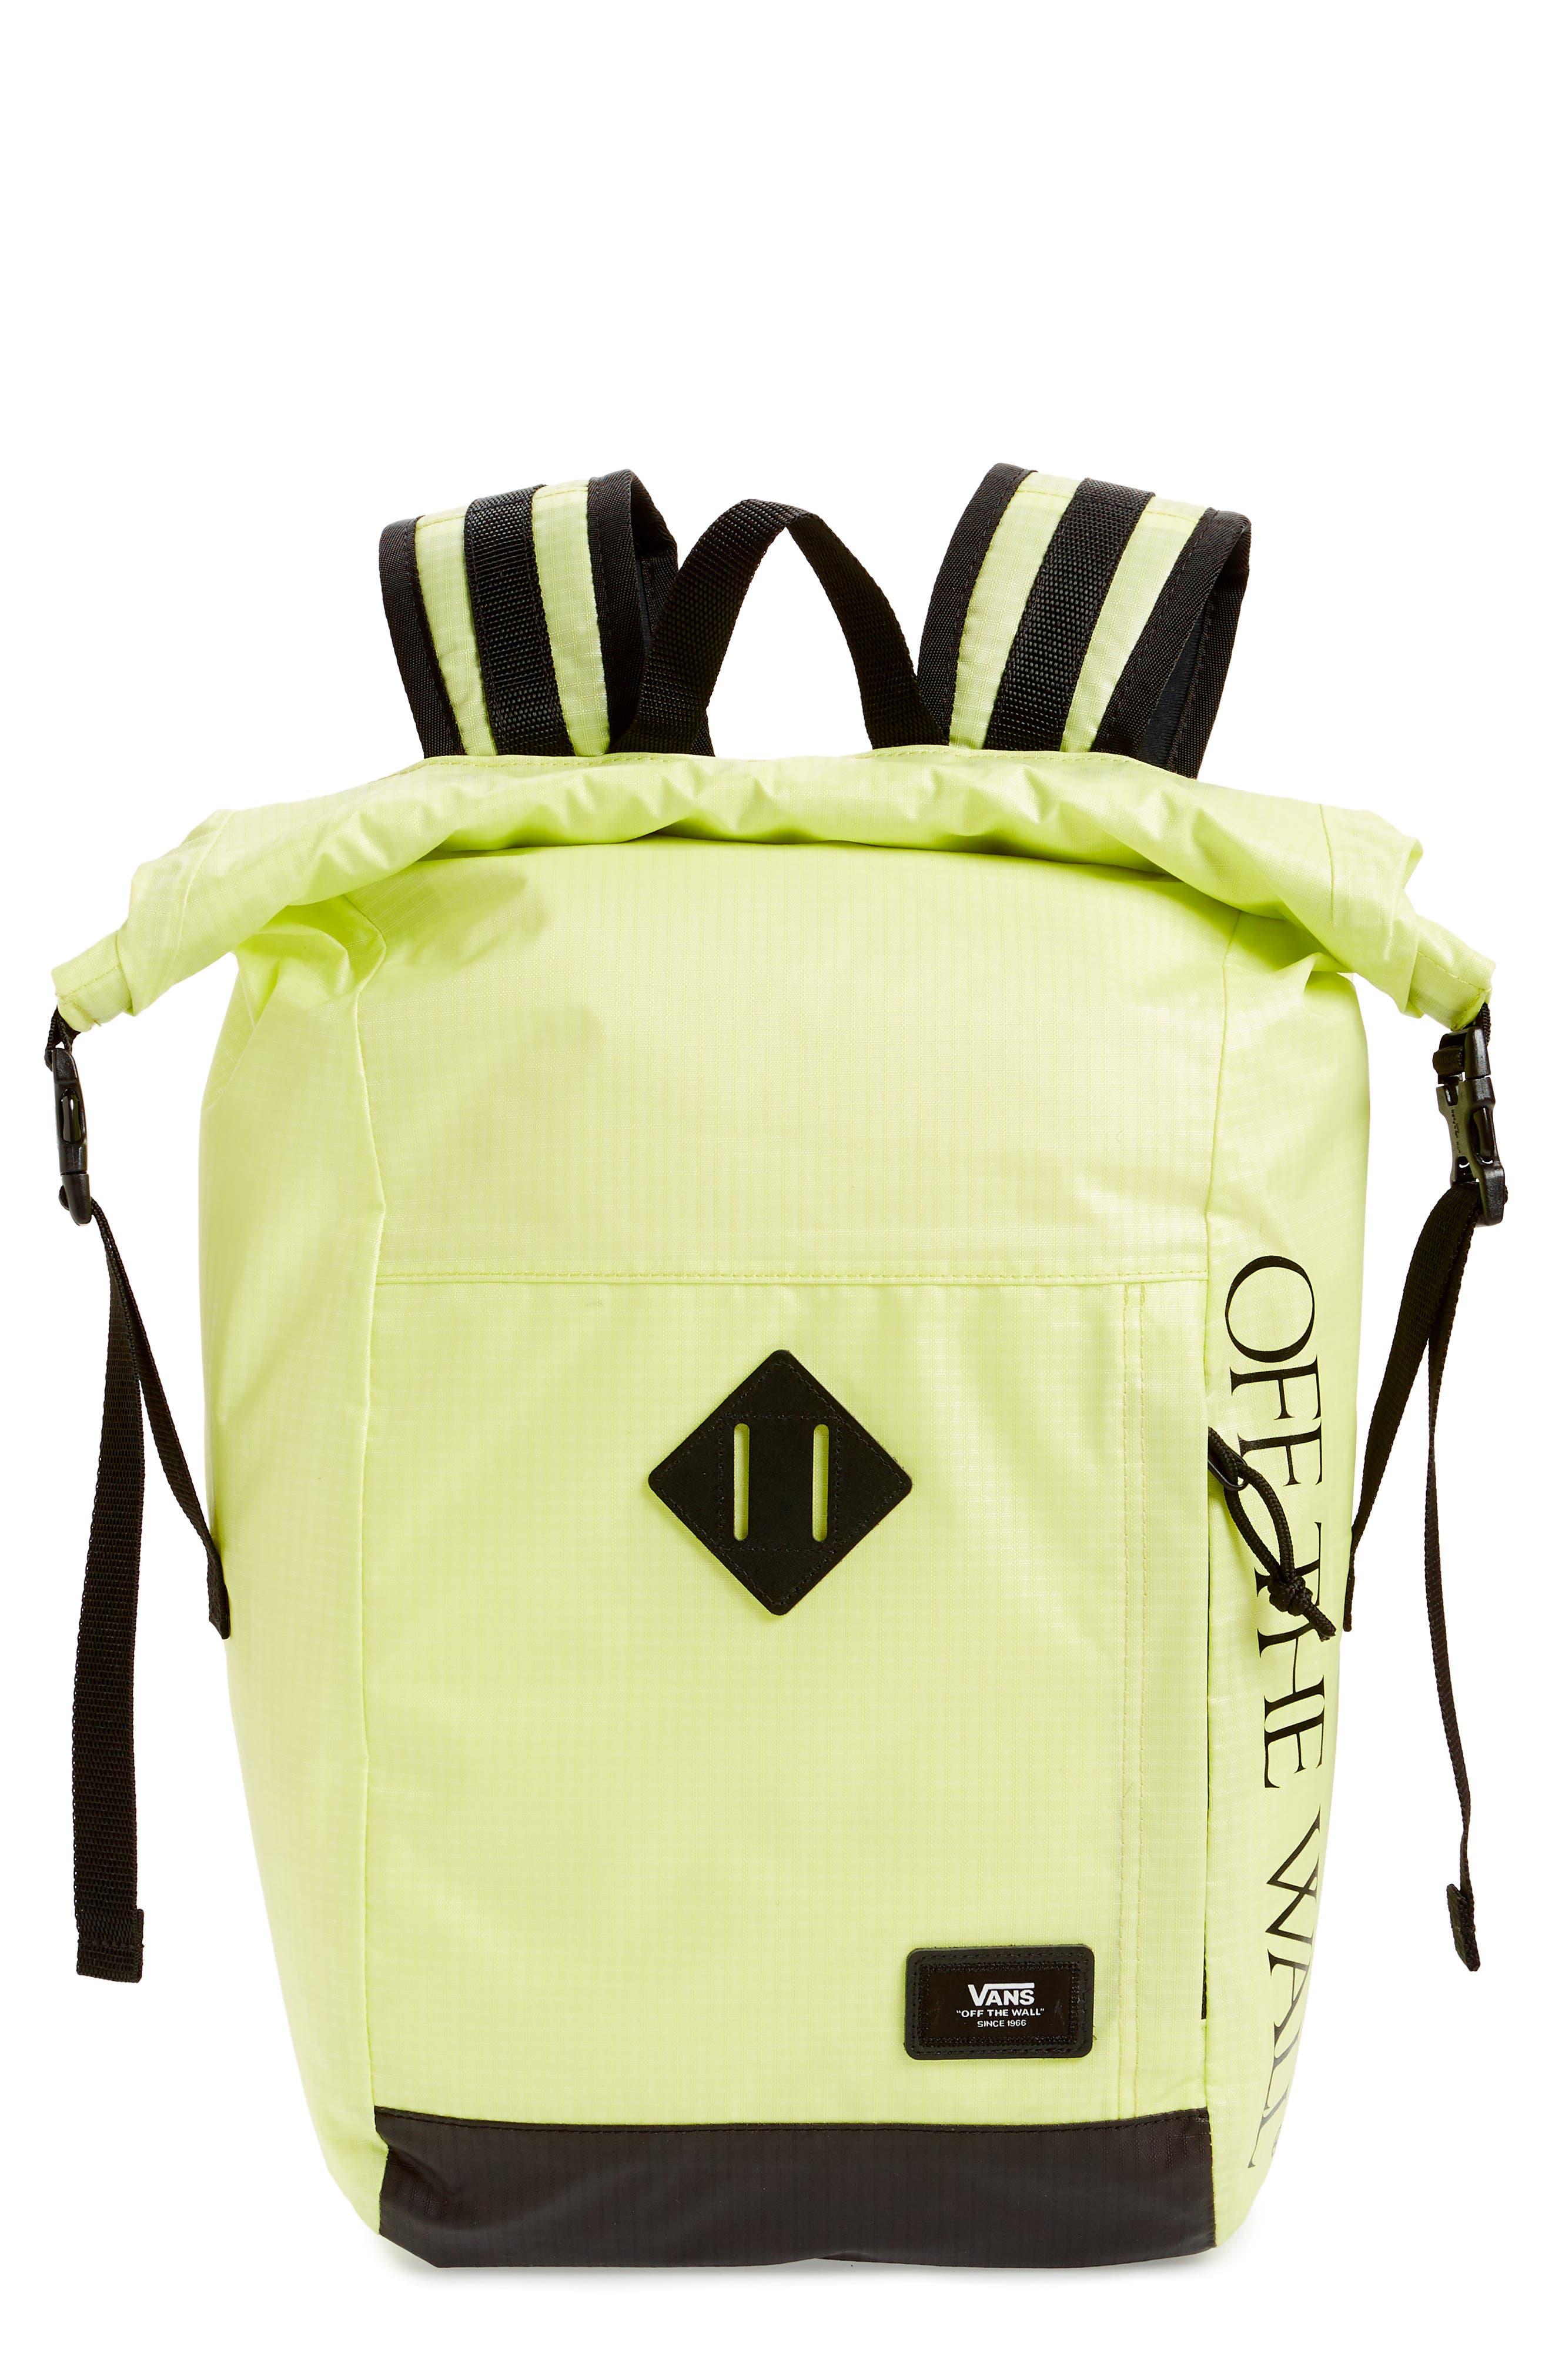 e5da6bcbf3f5 Vans Men's Backpacks Shoes & Fashion | Nordstrom